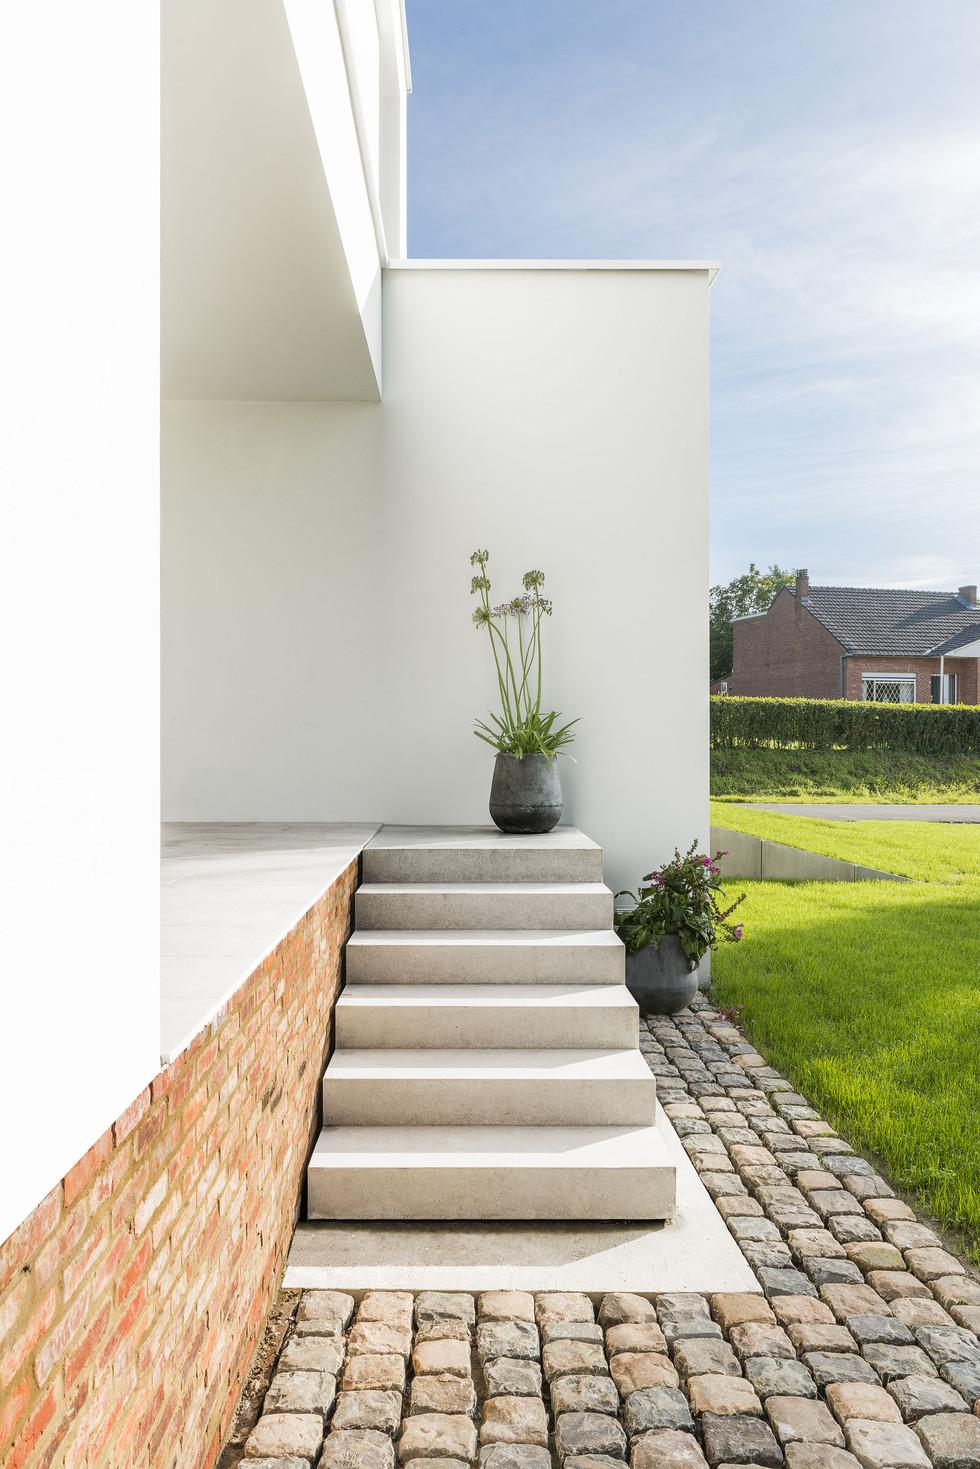 Architect: Klaarchitectuur